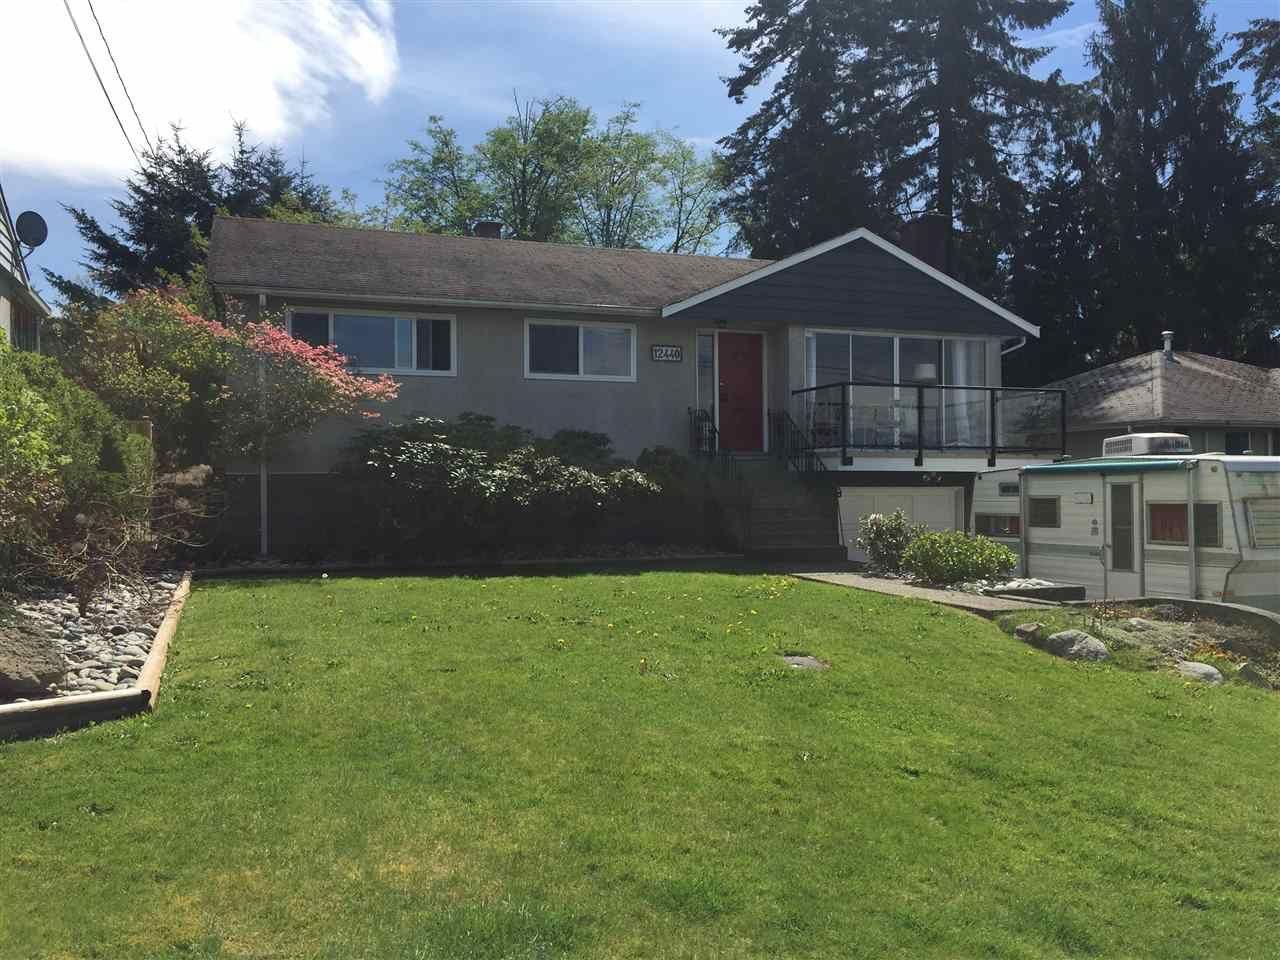 Main Photo: 12440 102 Avenue in Surrey: Cedar Hills House for sale (North Surrey)  : MLS®# R2162968